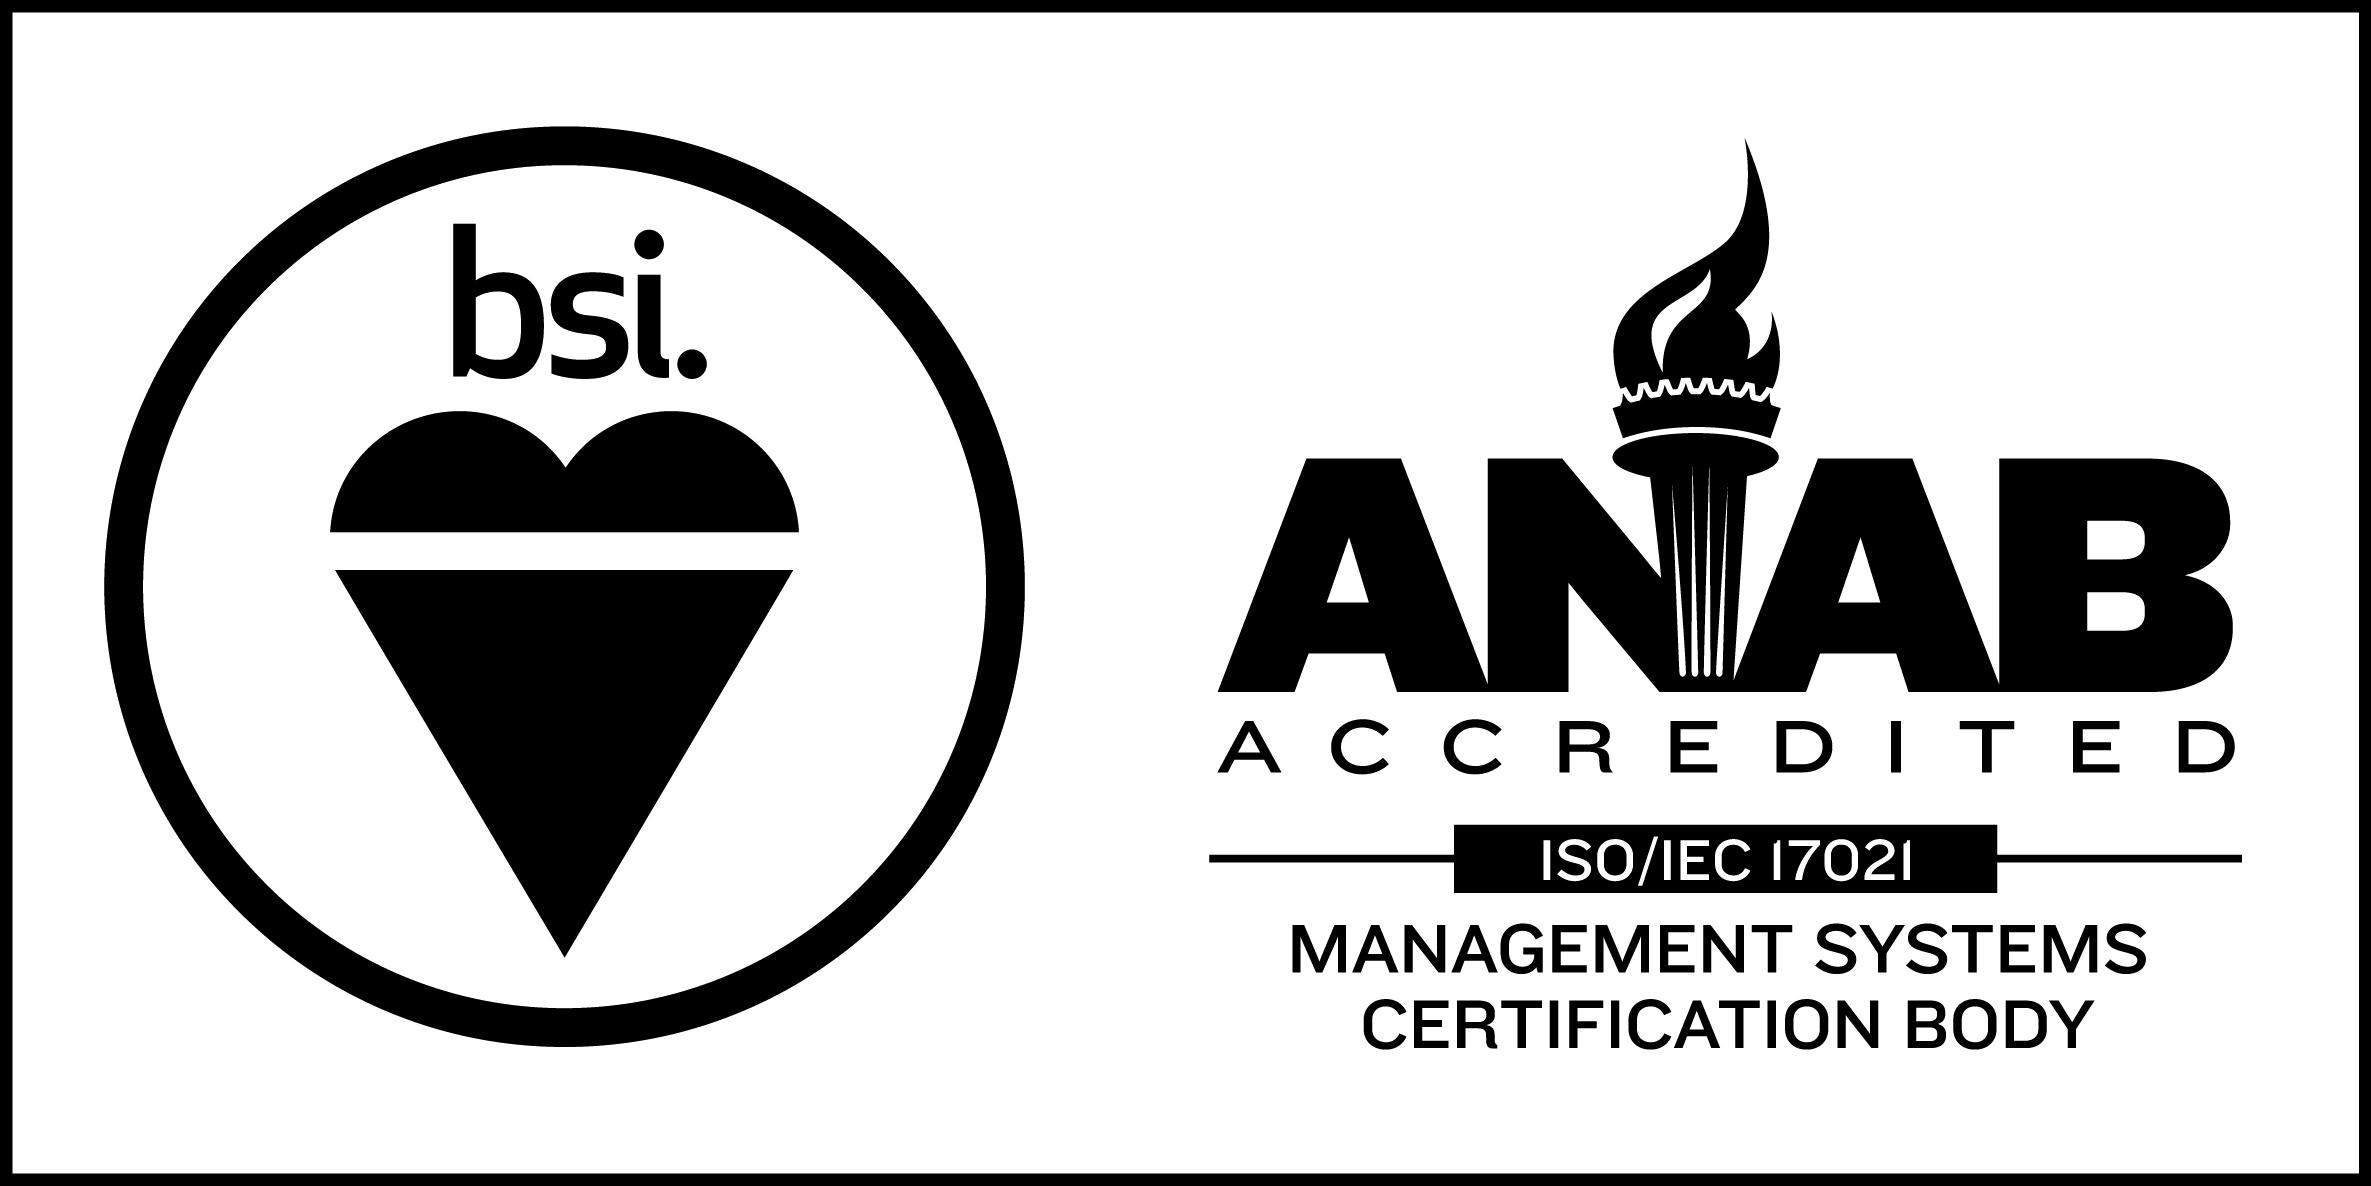 ANAB_BSI-Assurance-Mark BLK.jpg